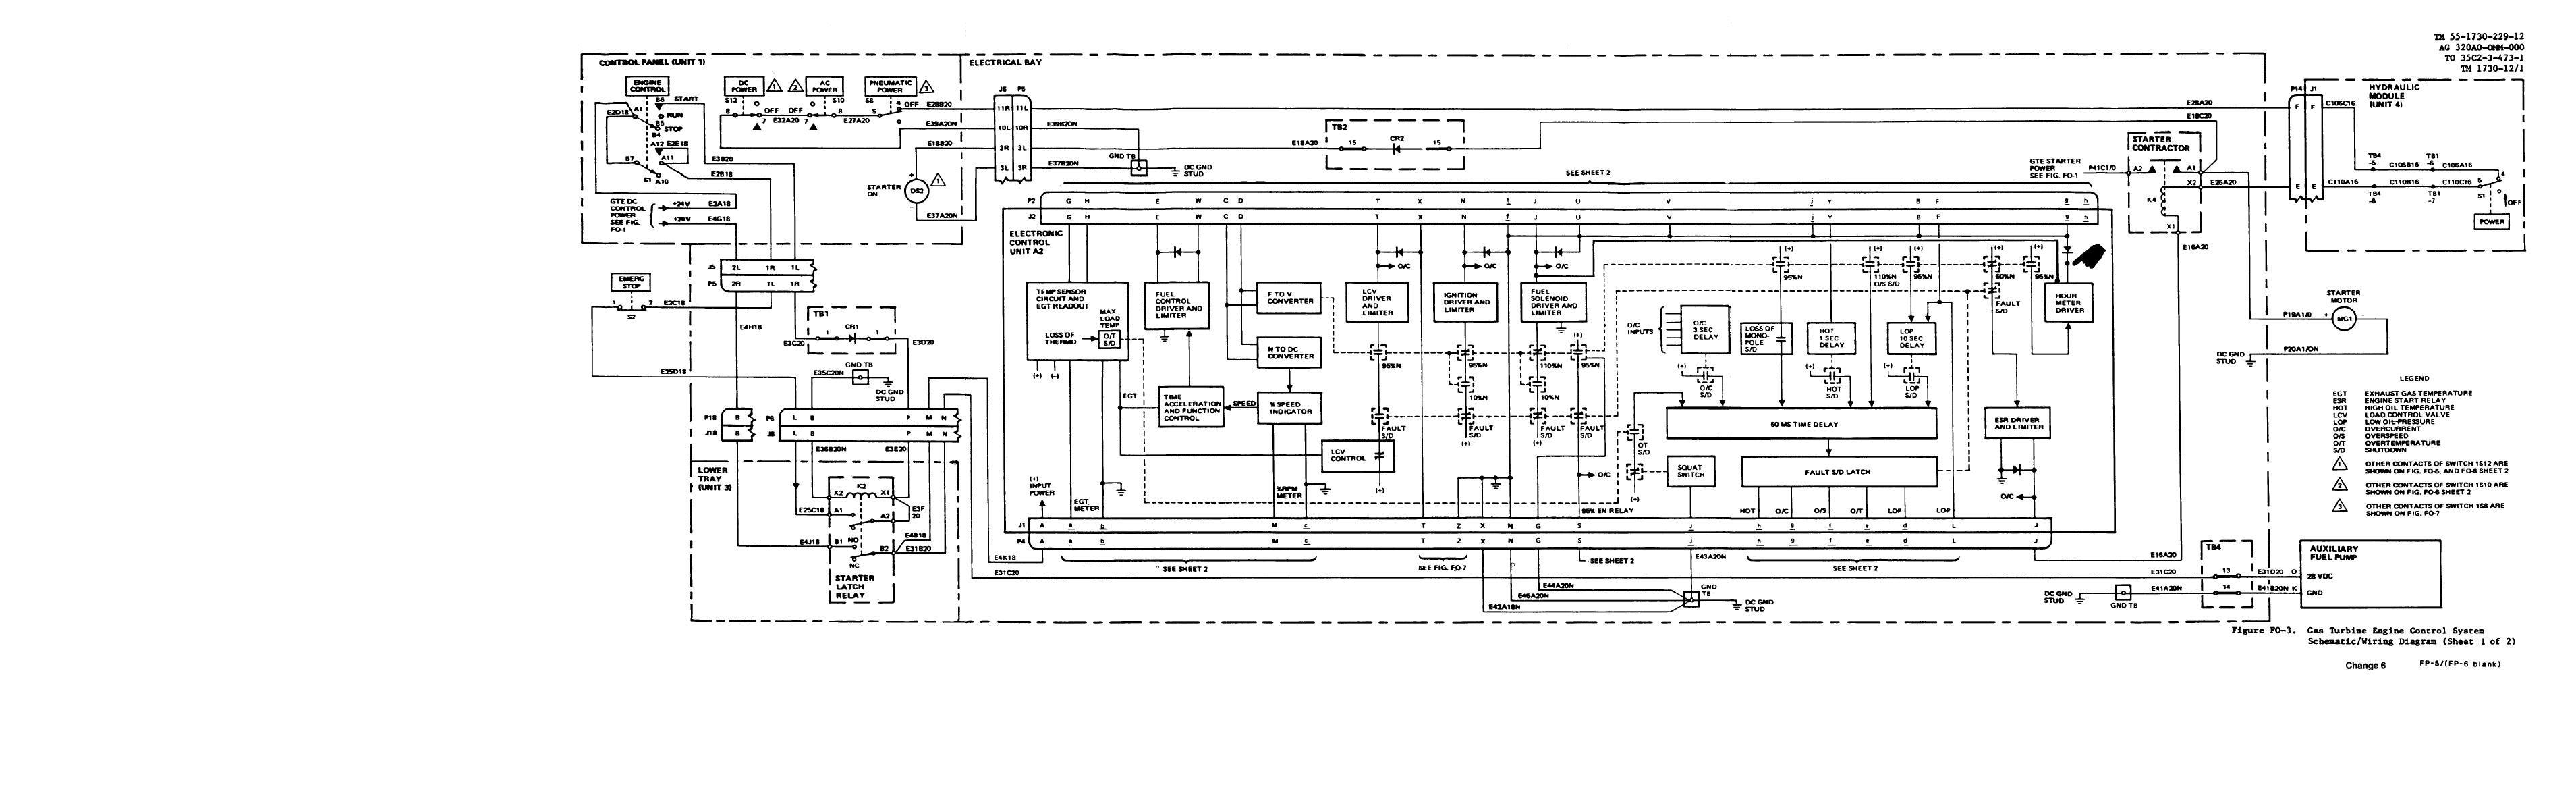 Turbine Engine Diagram Figure Fo 3 Gas Turbine Engine Control System Schematic Wiring Of Turbine Engine Diagram